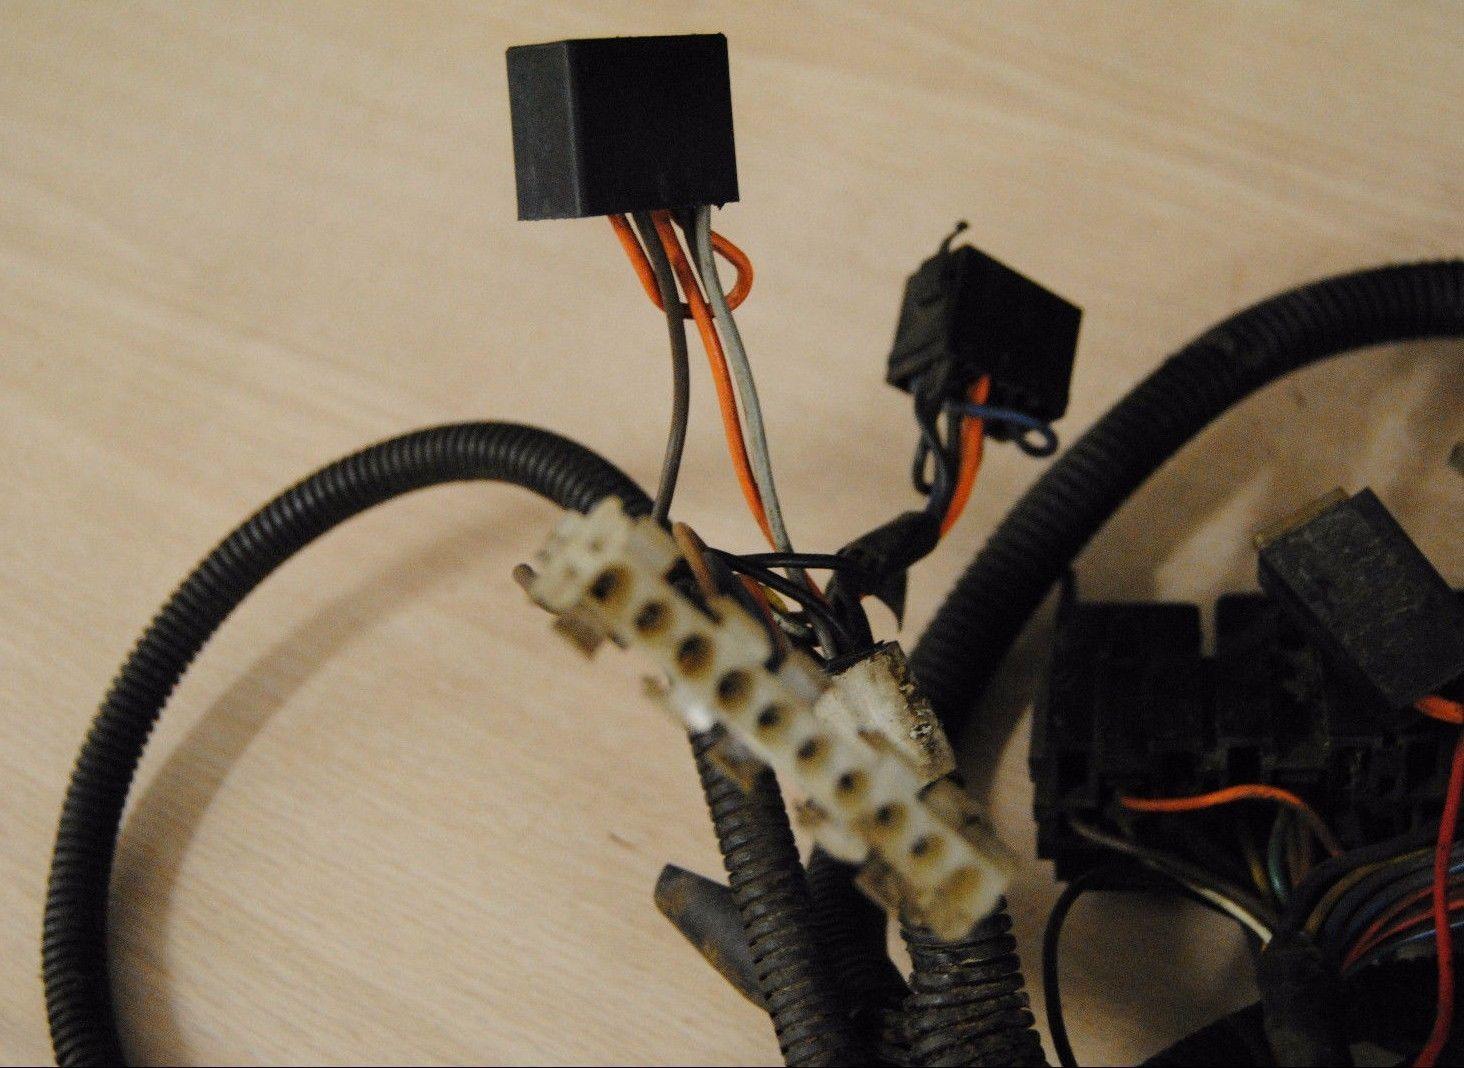 toro wheel horse 72102 wiring harness 100-4160 (jw8y7x)